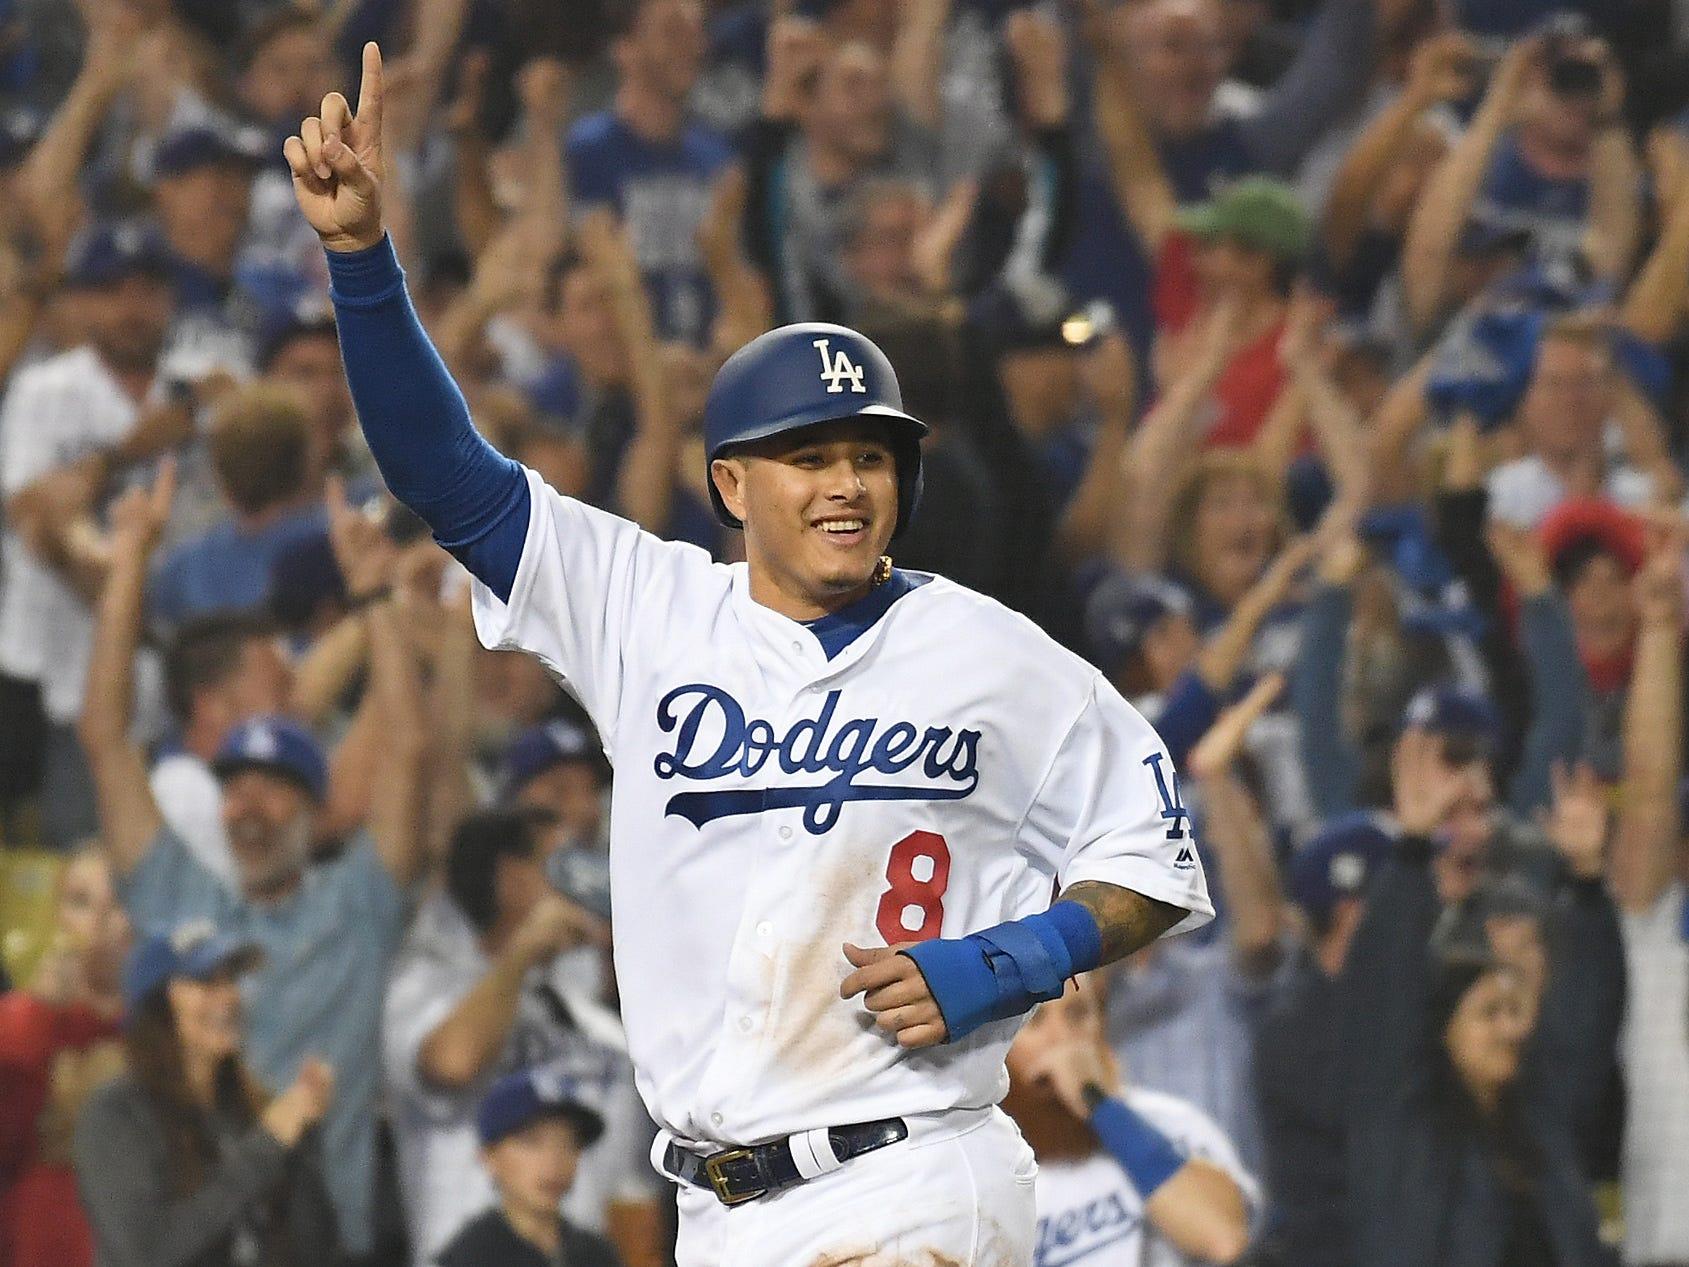 Manny Machado (26, SS/3B, Dodgers)